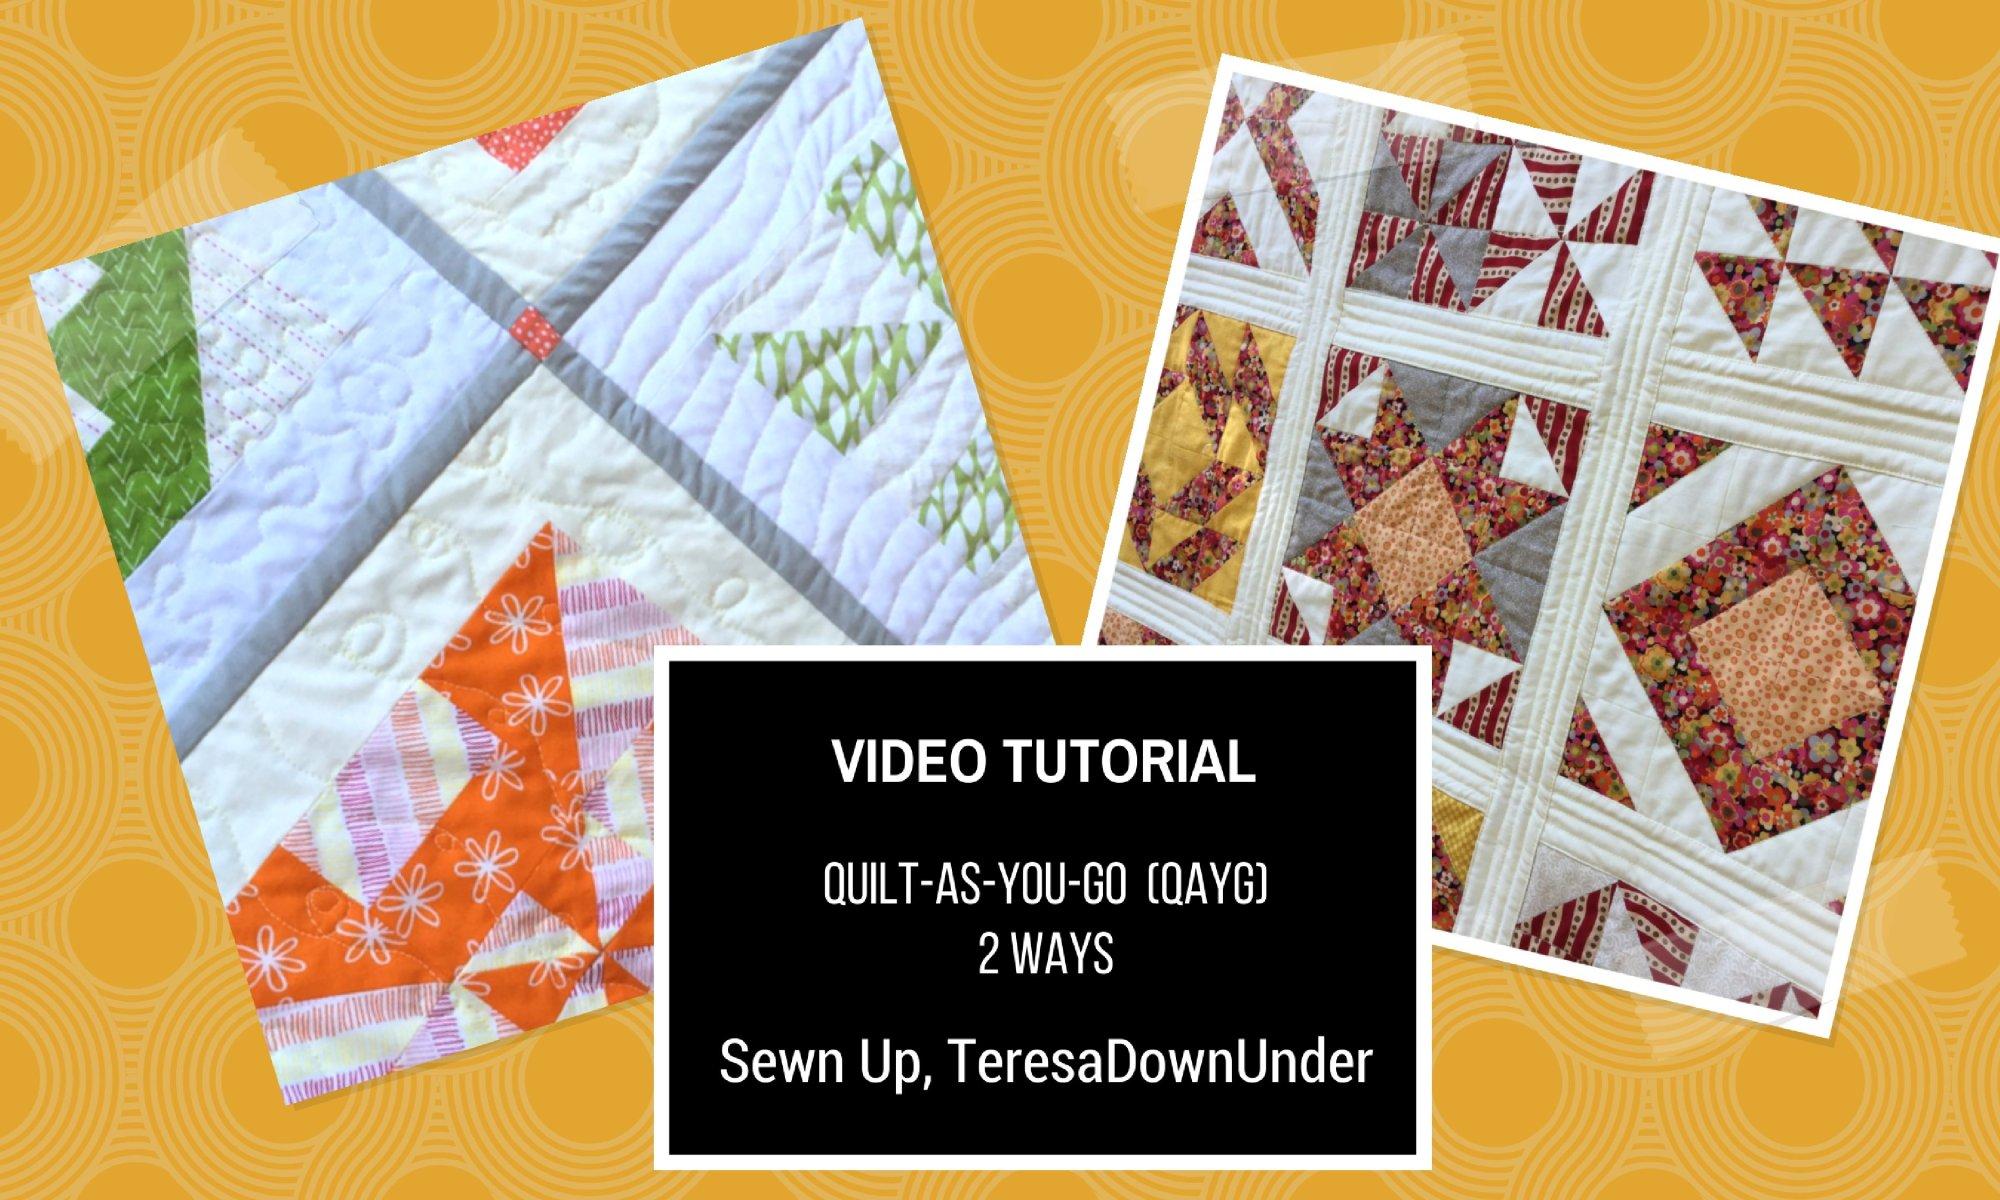 Video tutorial: Quilt-as-you-go (QAYG) 2 ways